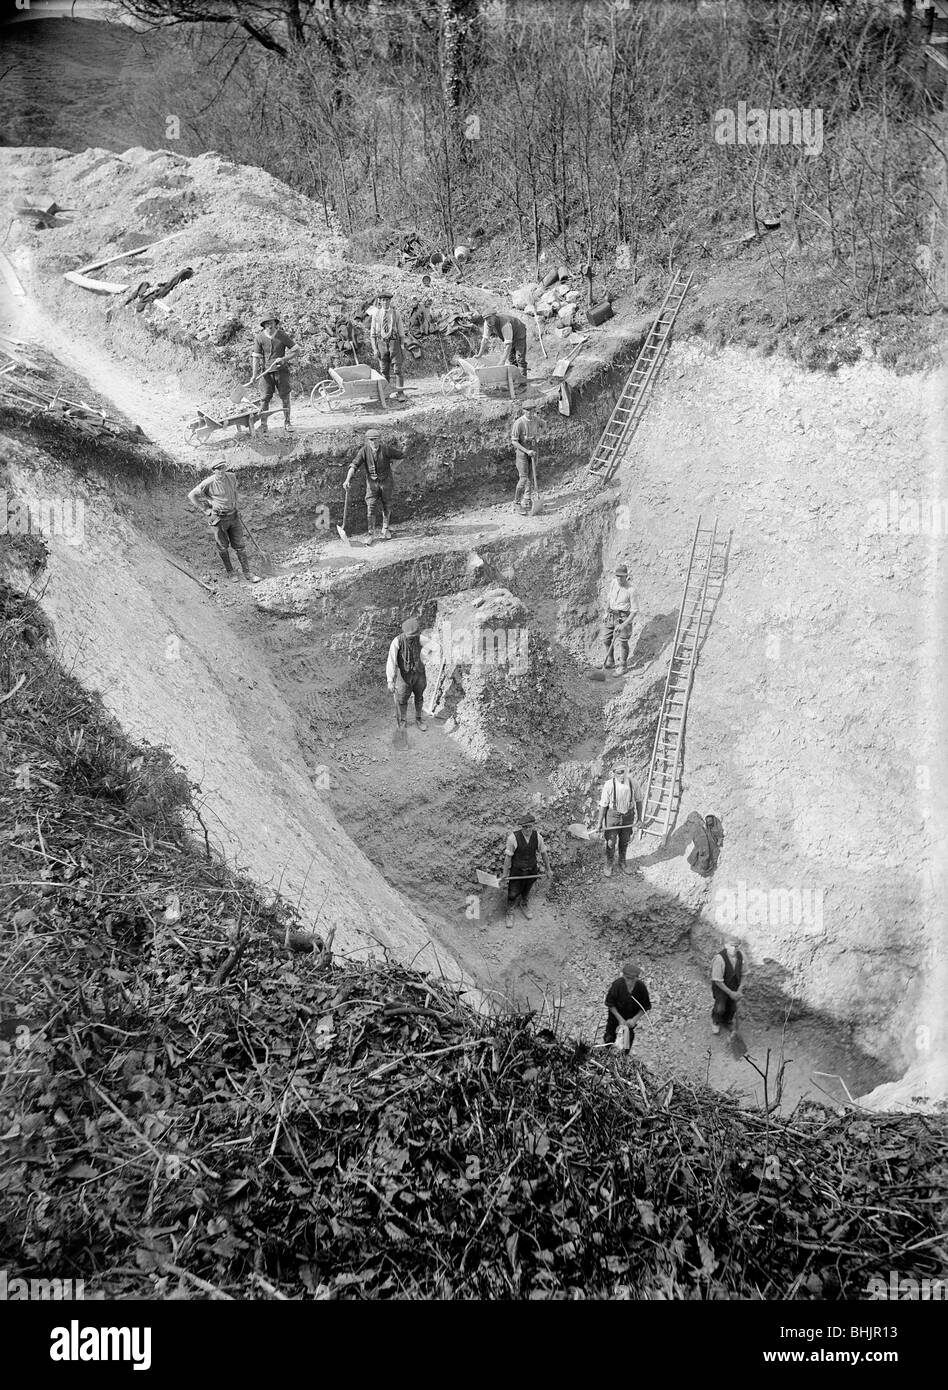 Excavation at Avebury, Wiltshire, 1922. Artist: Harold St George Gray - Stock Image